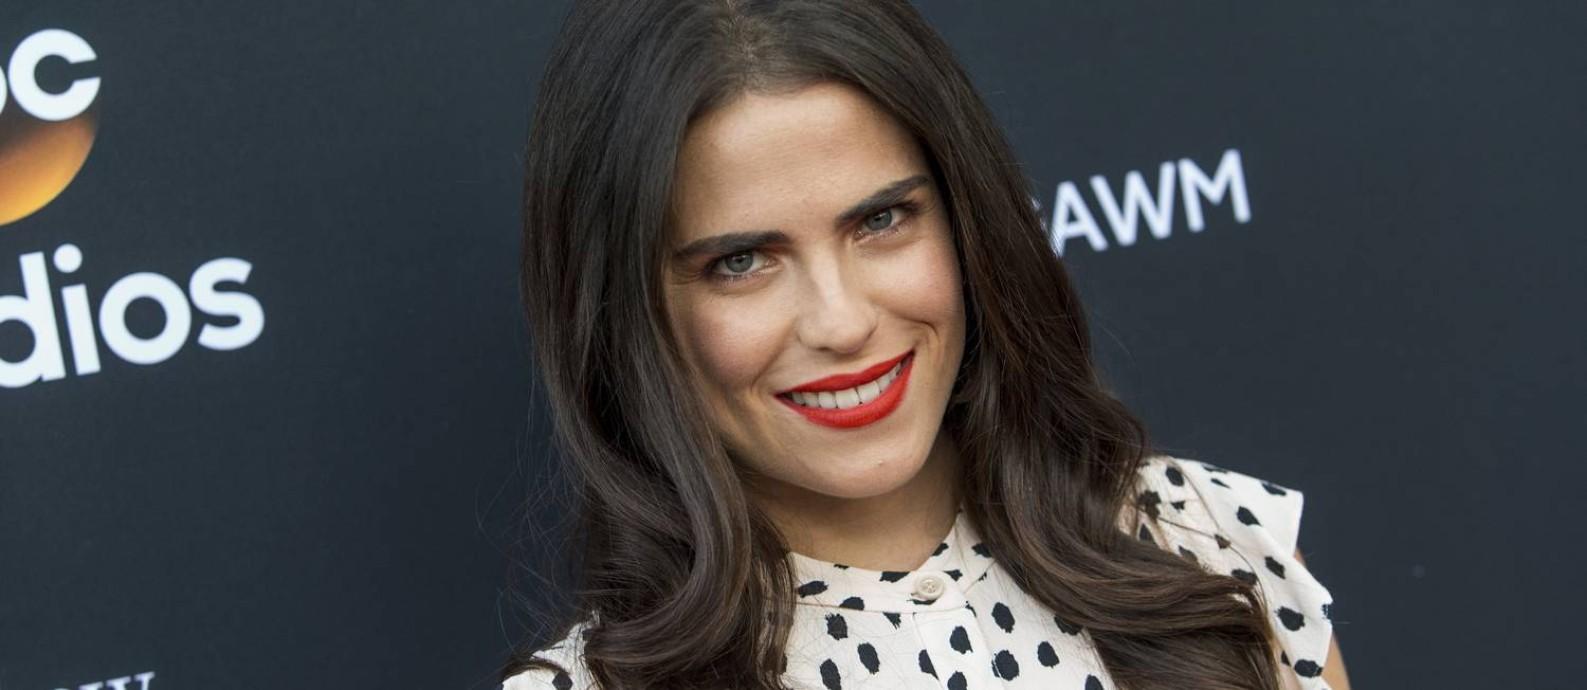 A atriz Karla Souza, de 'How to get away with murder' Foto: Paul A. Hebert/Invision/AP